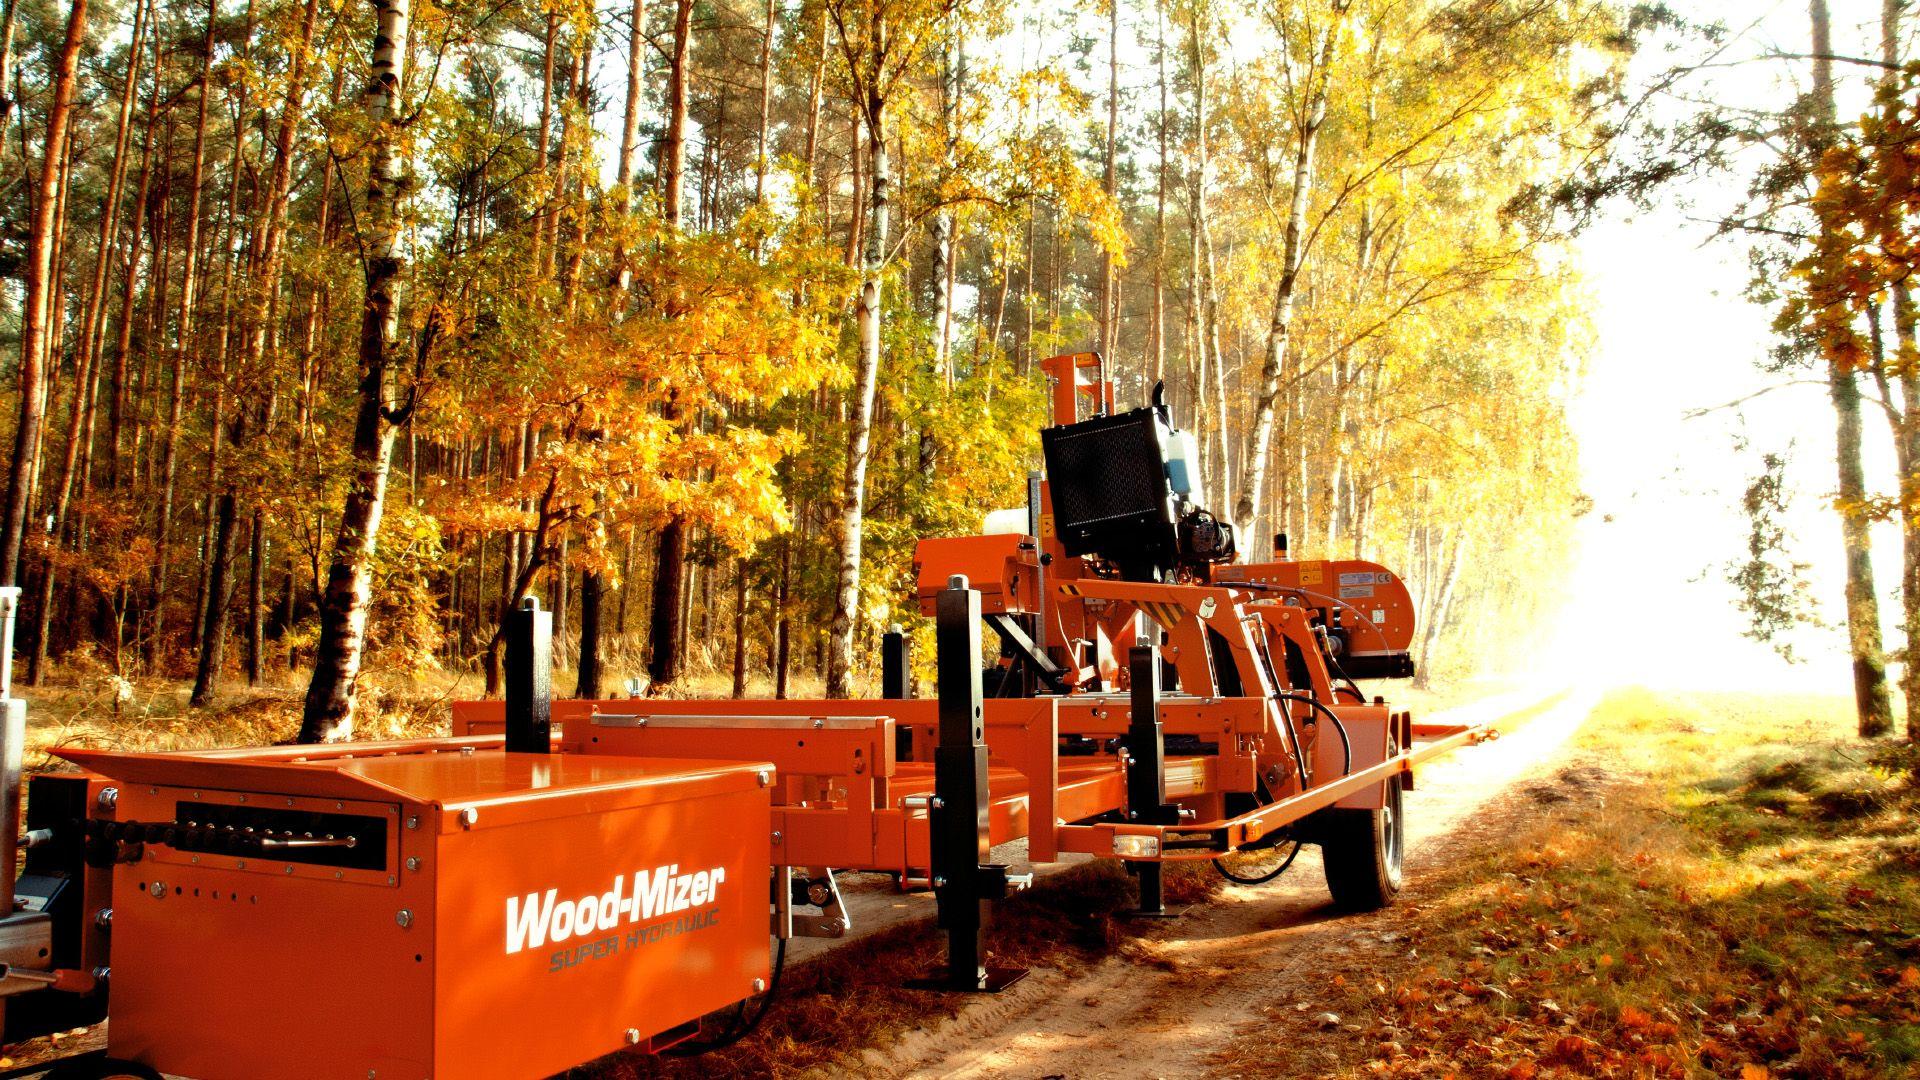 sawing ash with woodmizer lt70 d dµn d d d d dod sawmill pinterest ash